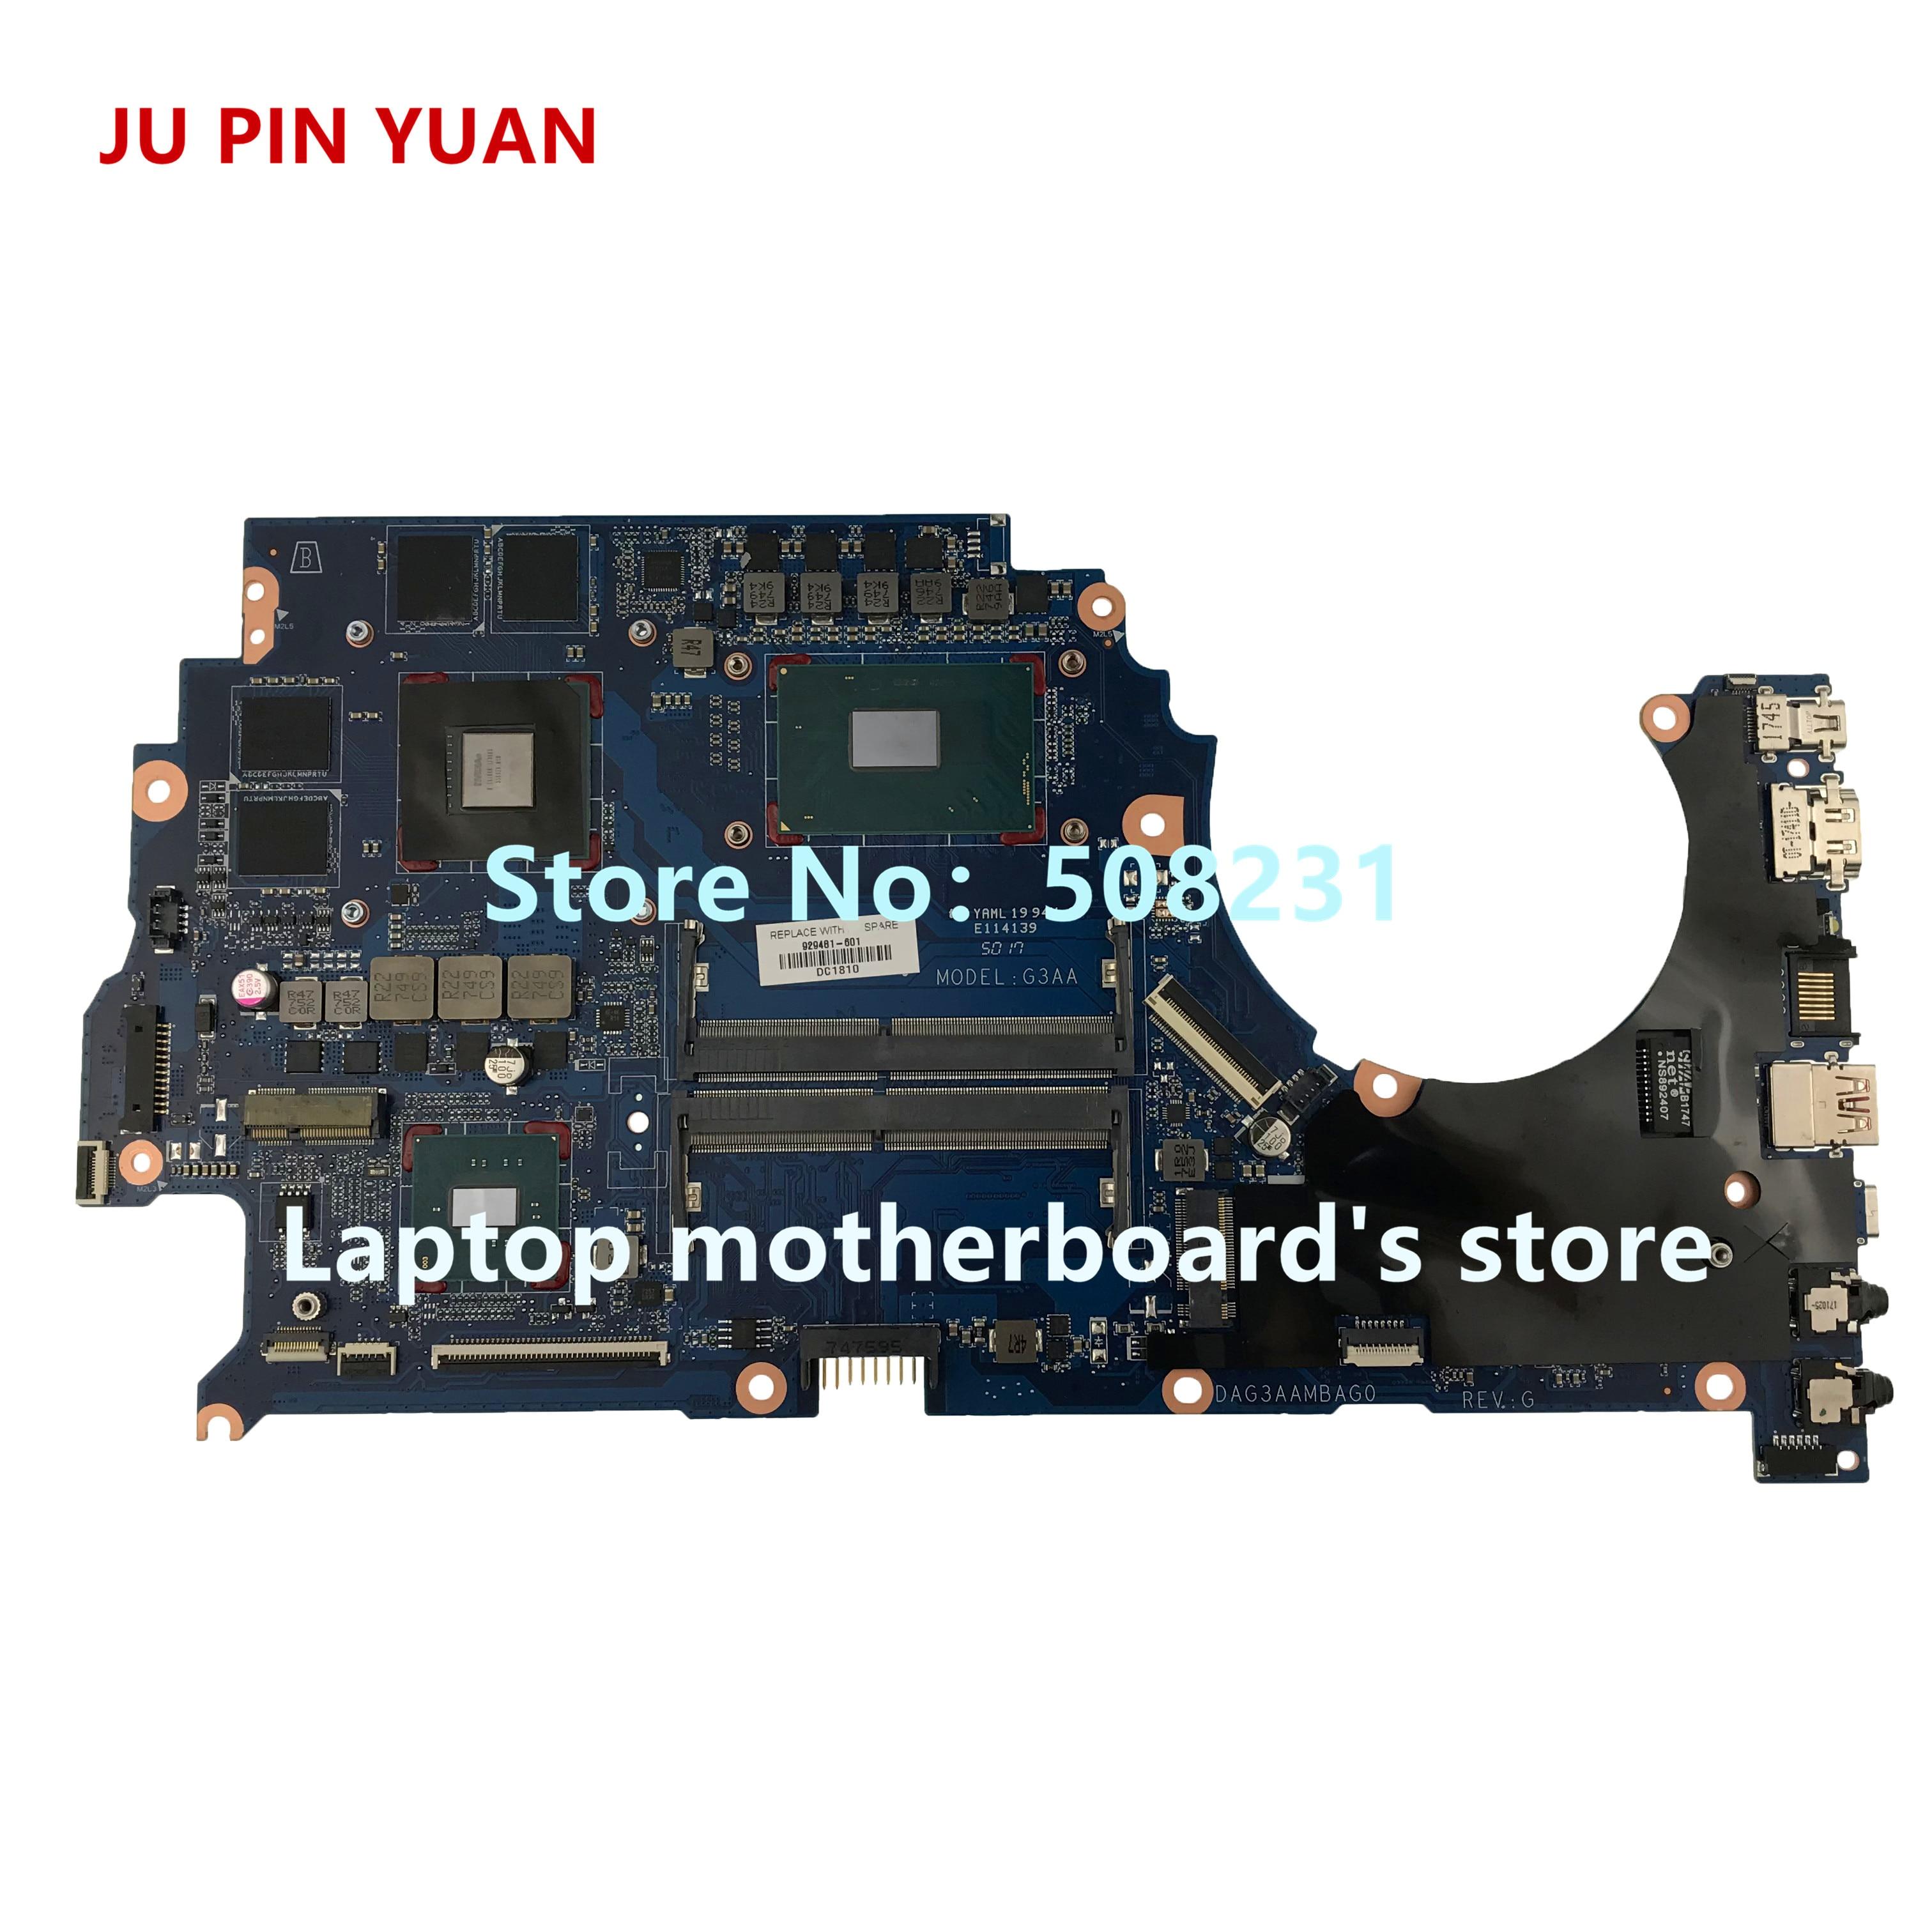 JU PIN YUAN 929481-601 motherboard Para PRESSÁGIO DAG3AAMBAE0 G3AA pela HP Laptop Notebook PC GTX1050Ti 15-ce 4 gb i7-7700HQ totalmente Testado